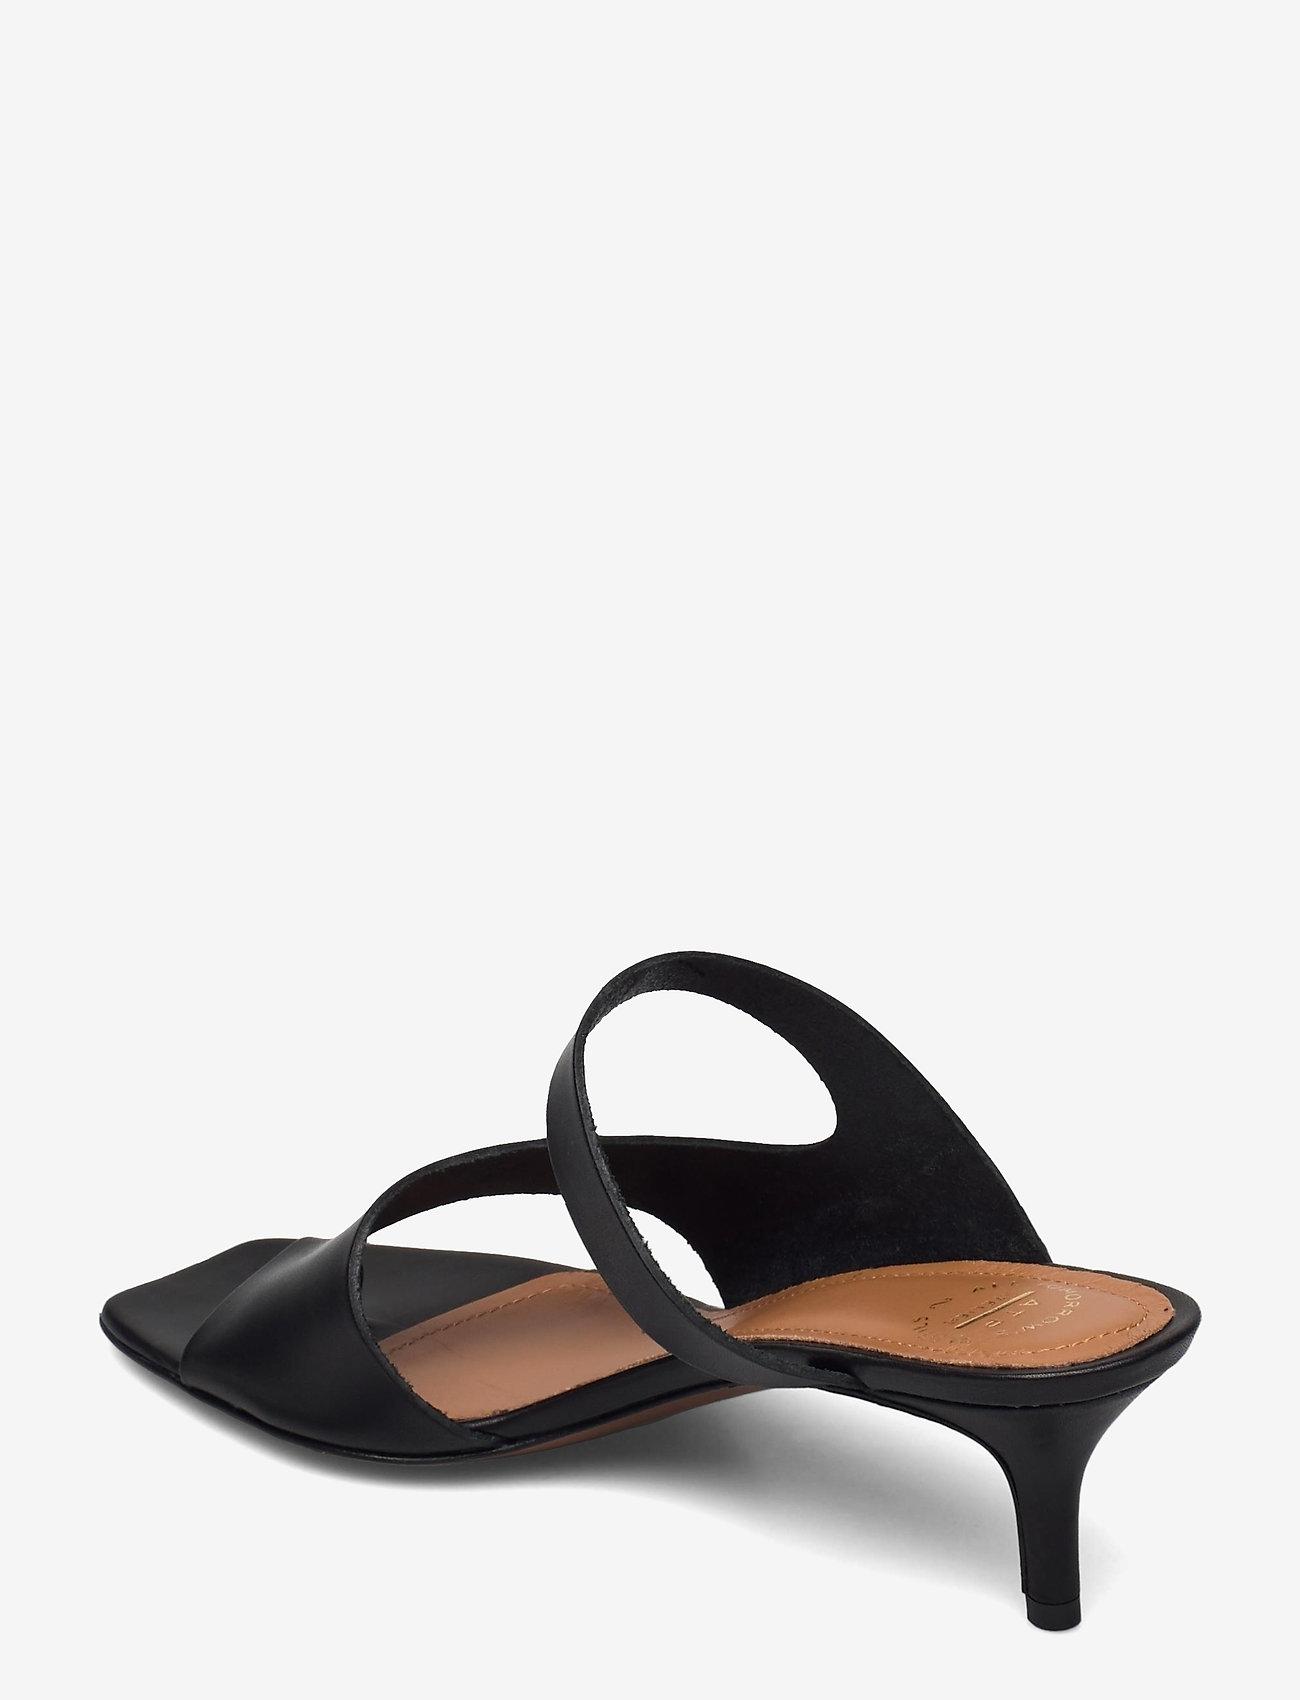 ATP Atelier - Pittuini Black Vacchetta - högklackade sandaler - black - 2